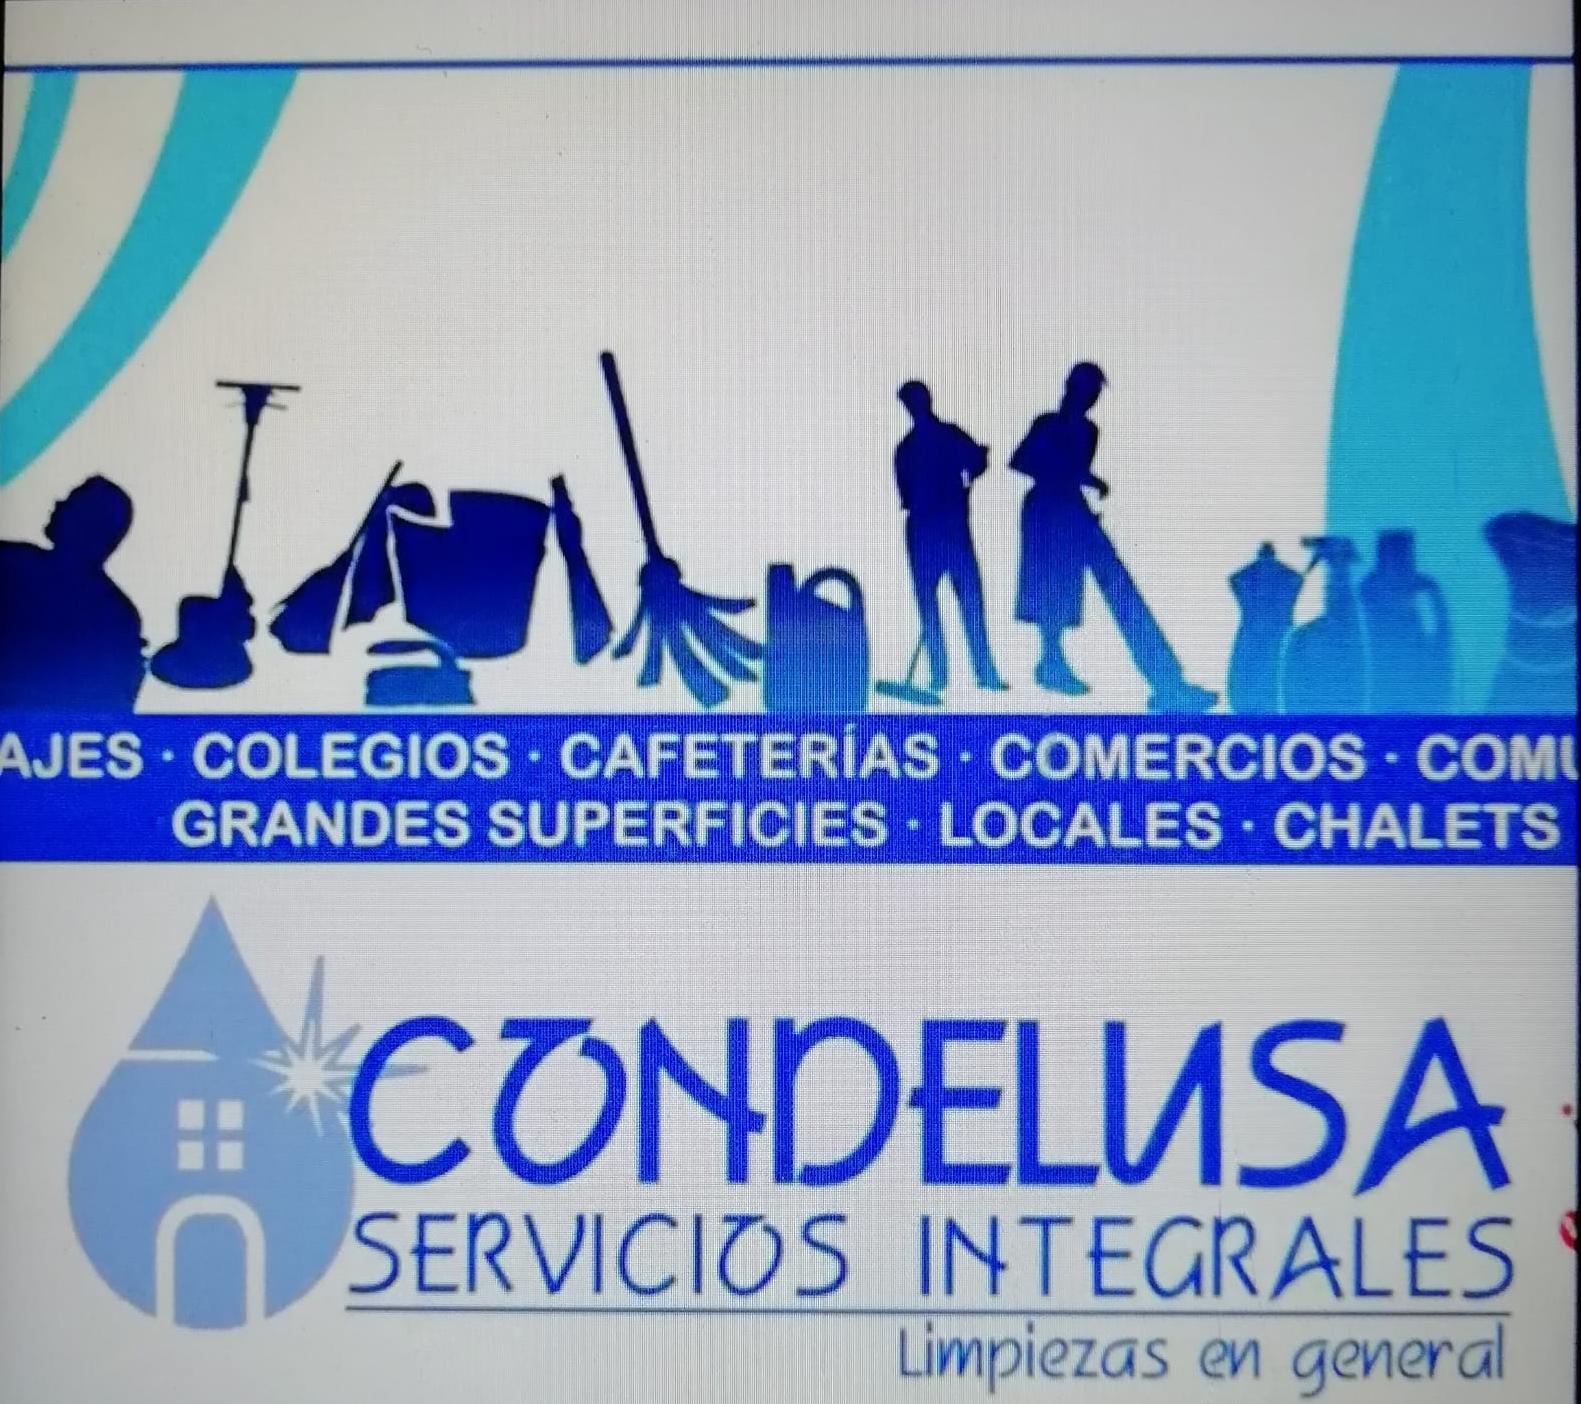 Condelusa, S.L.